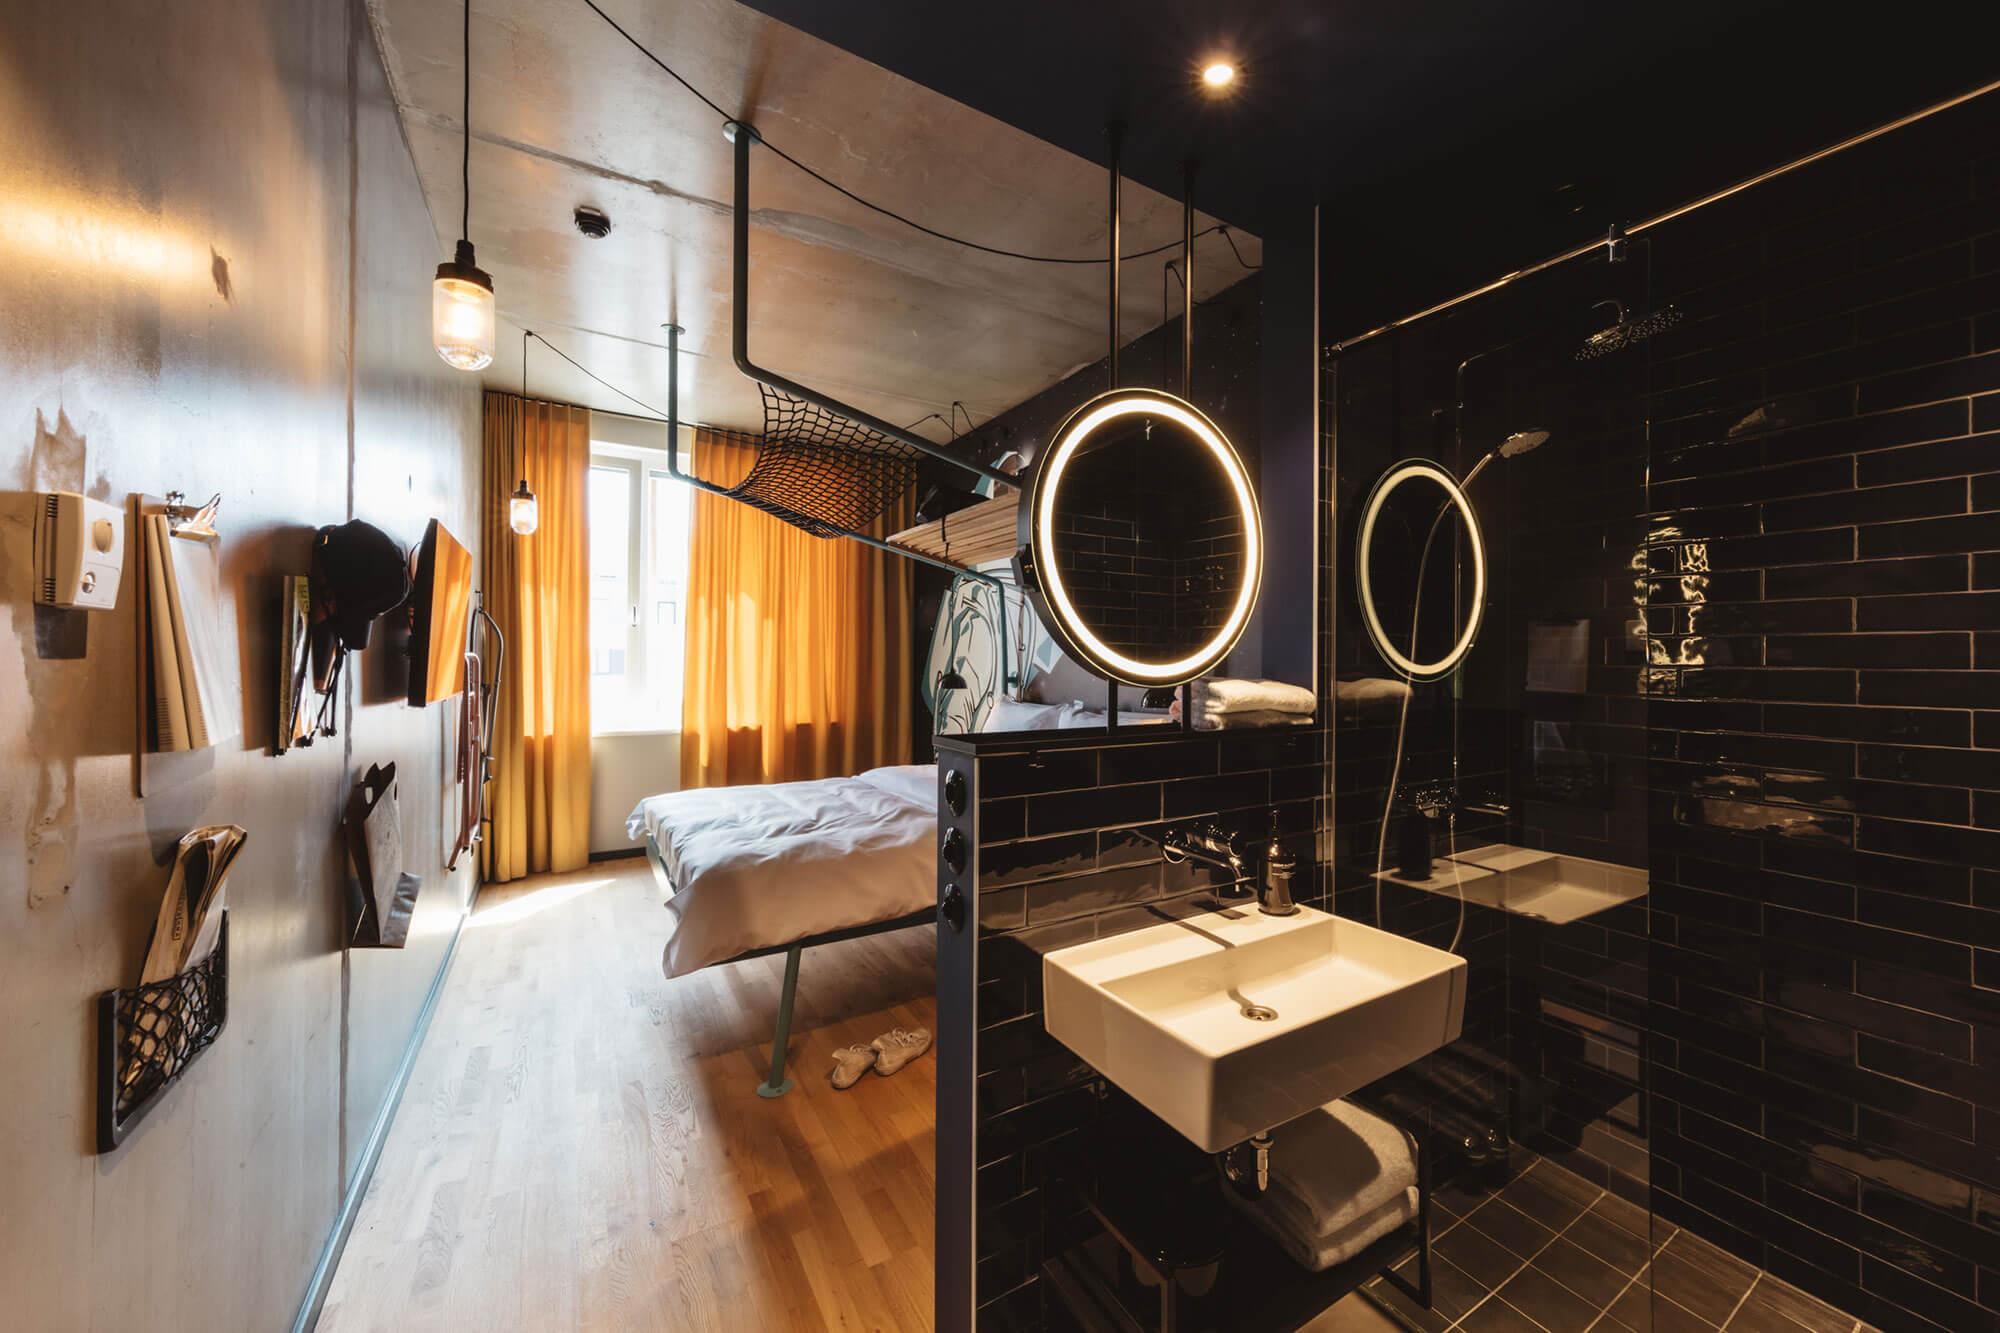 Superbude-Hotel-Hostel-Bachhuber-Hoteleinrichtungen-8